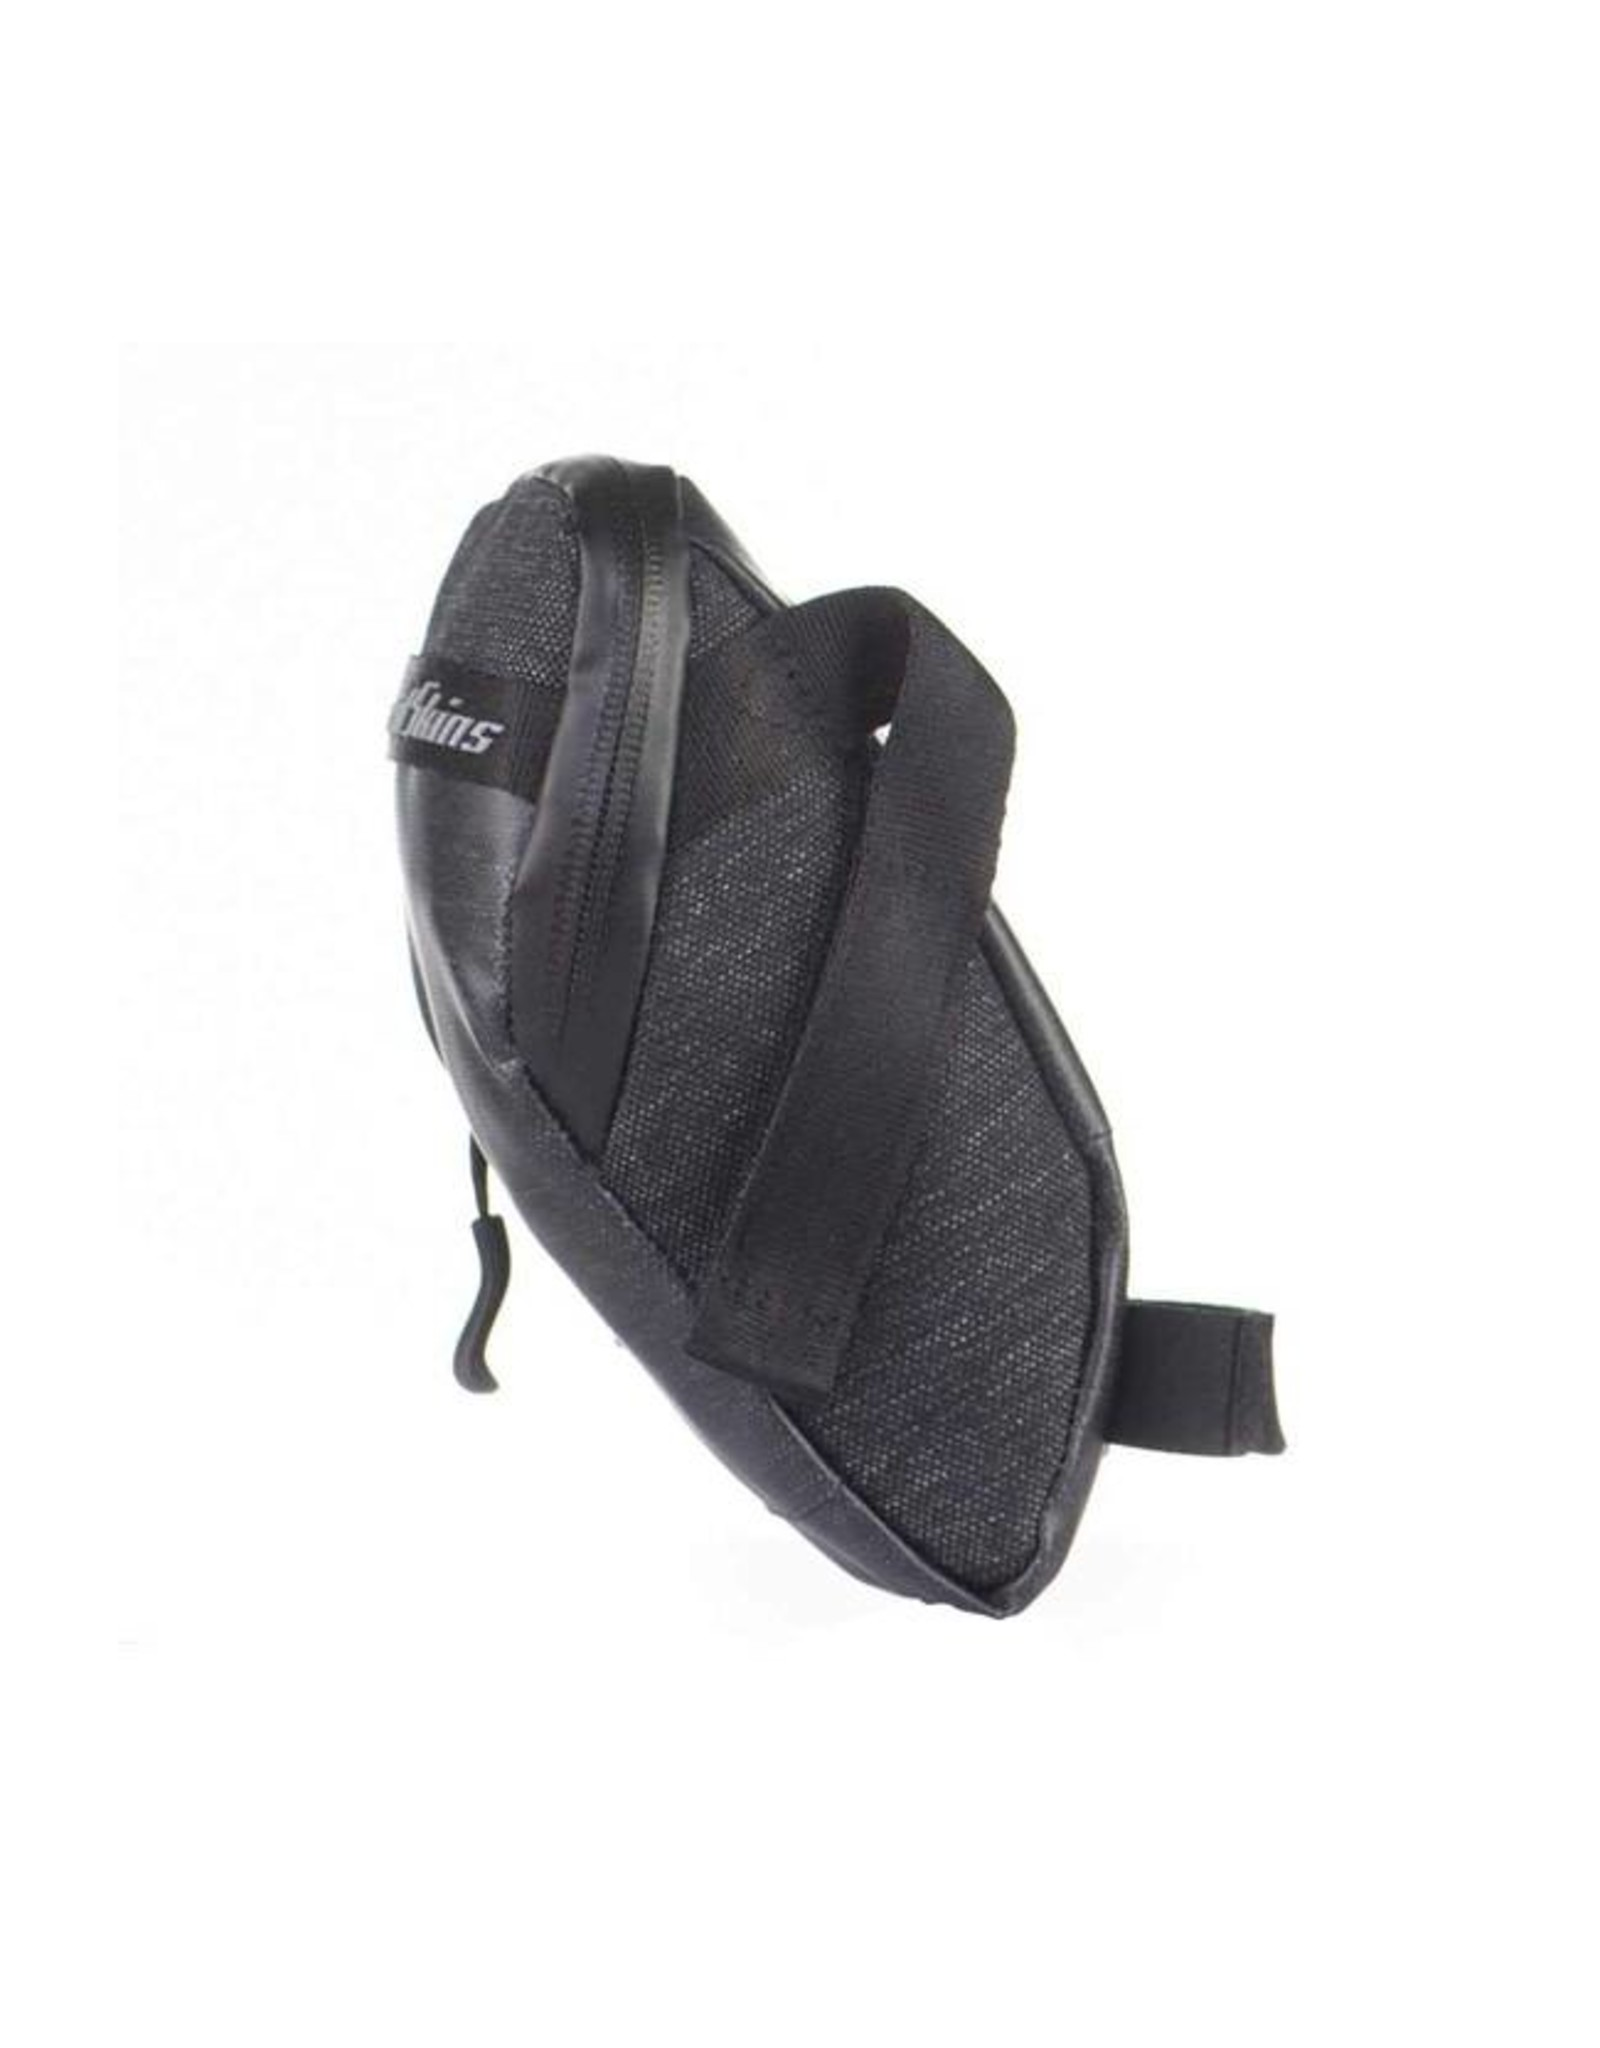 Lizard Skins Lizard Skins Super Cache Seat Bag: Jet Black